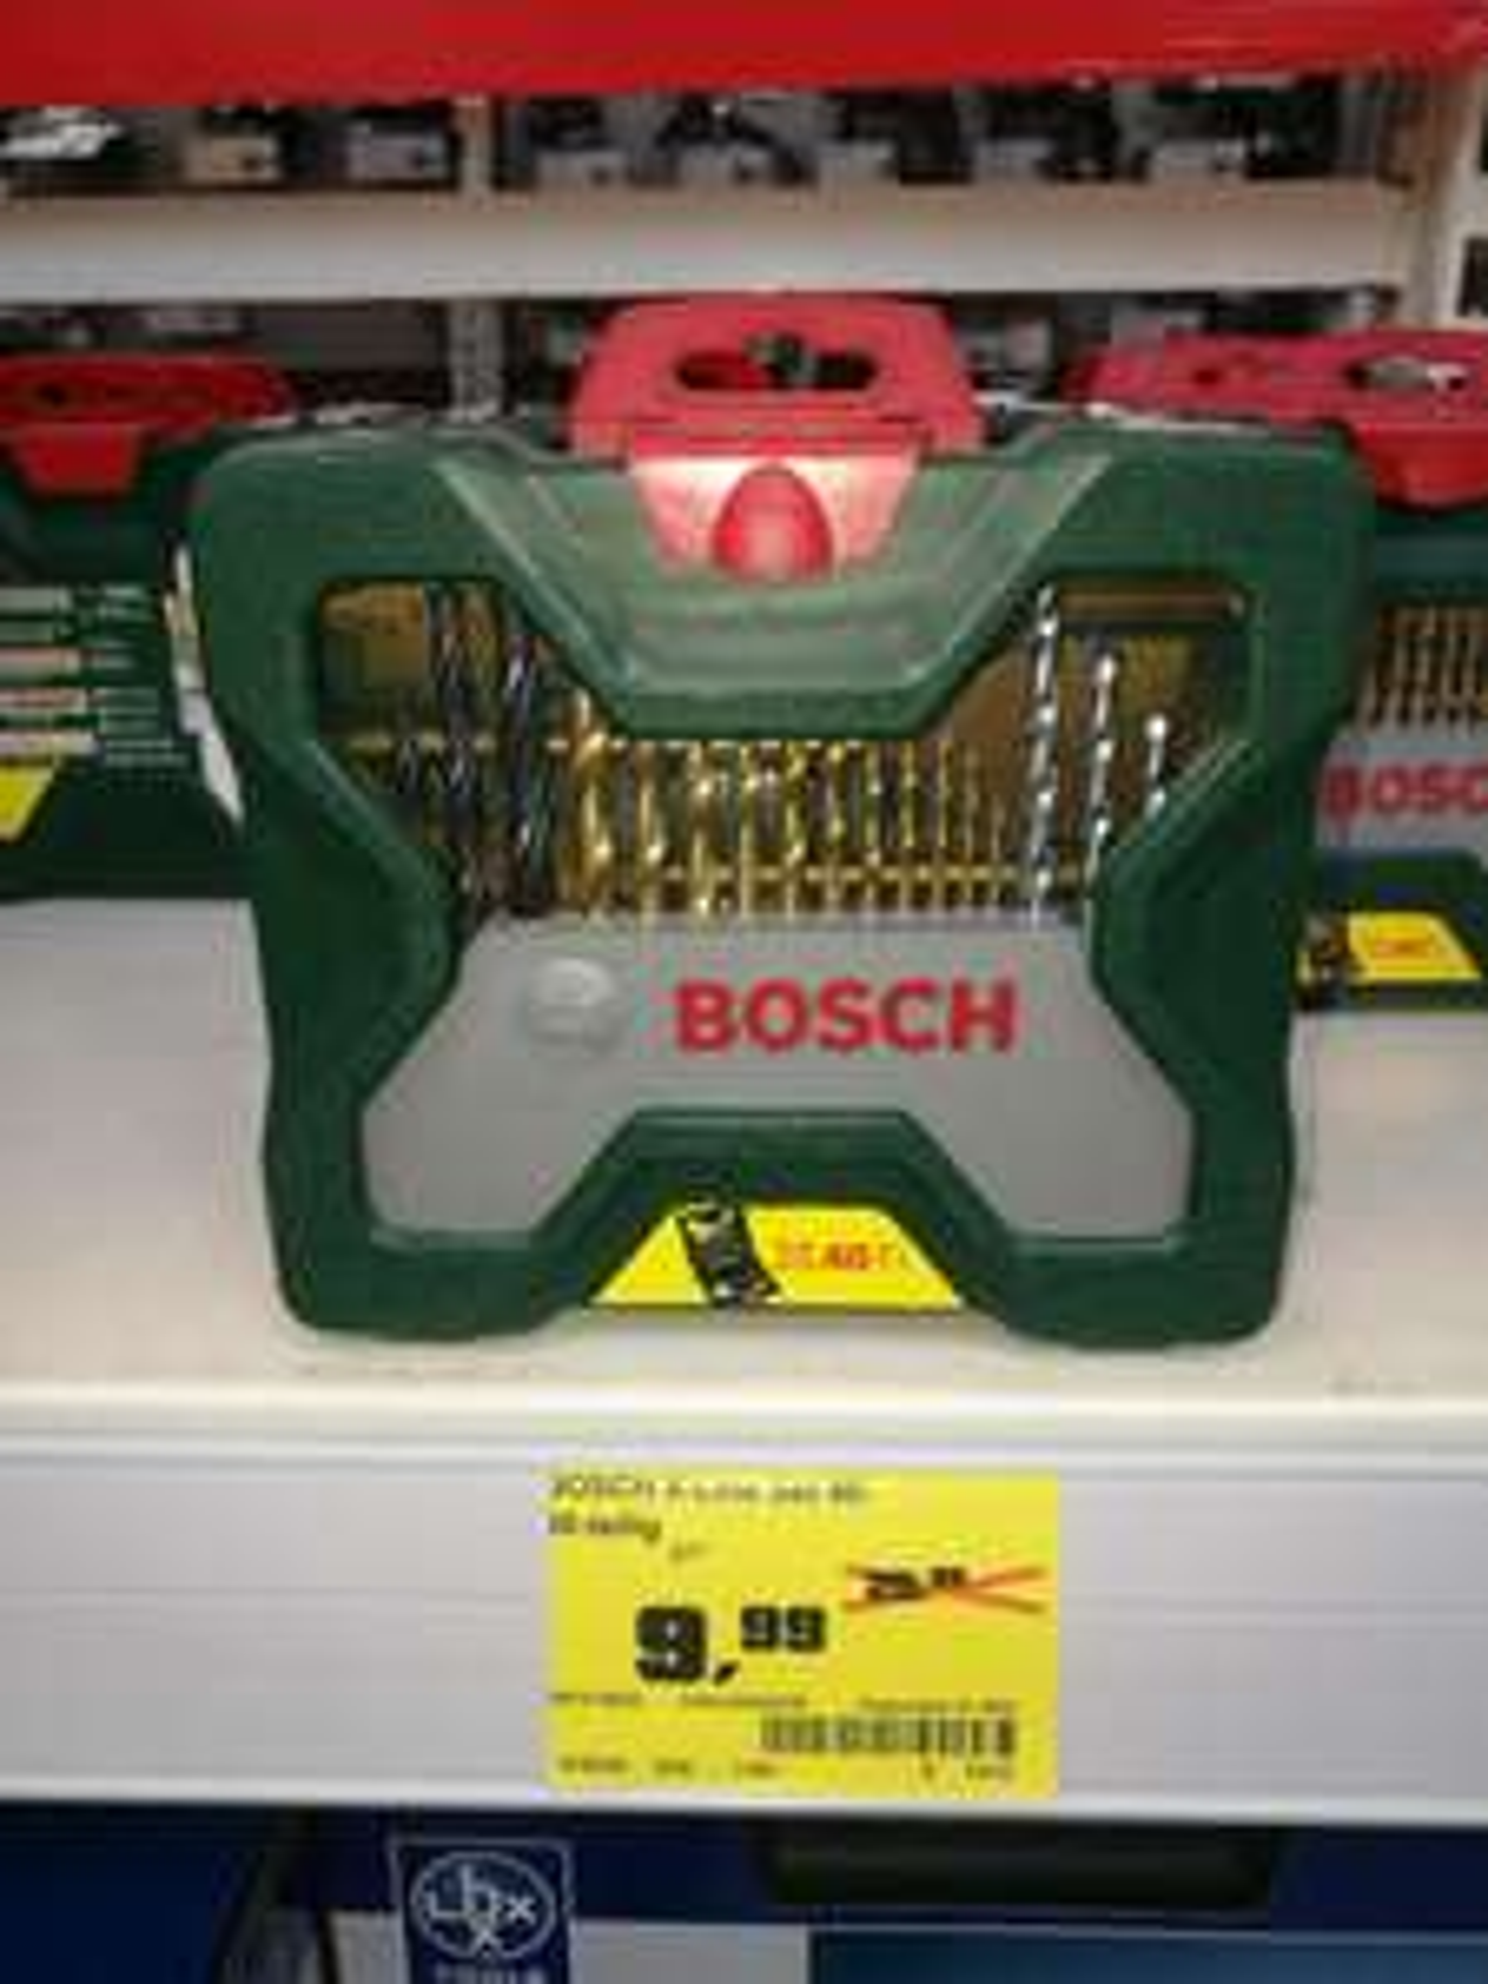 (Lokal OBI Naumburg) Über 61% Rabatt - Bosch Bohrer/-bitsatz X40Ti